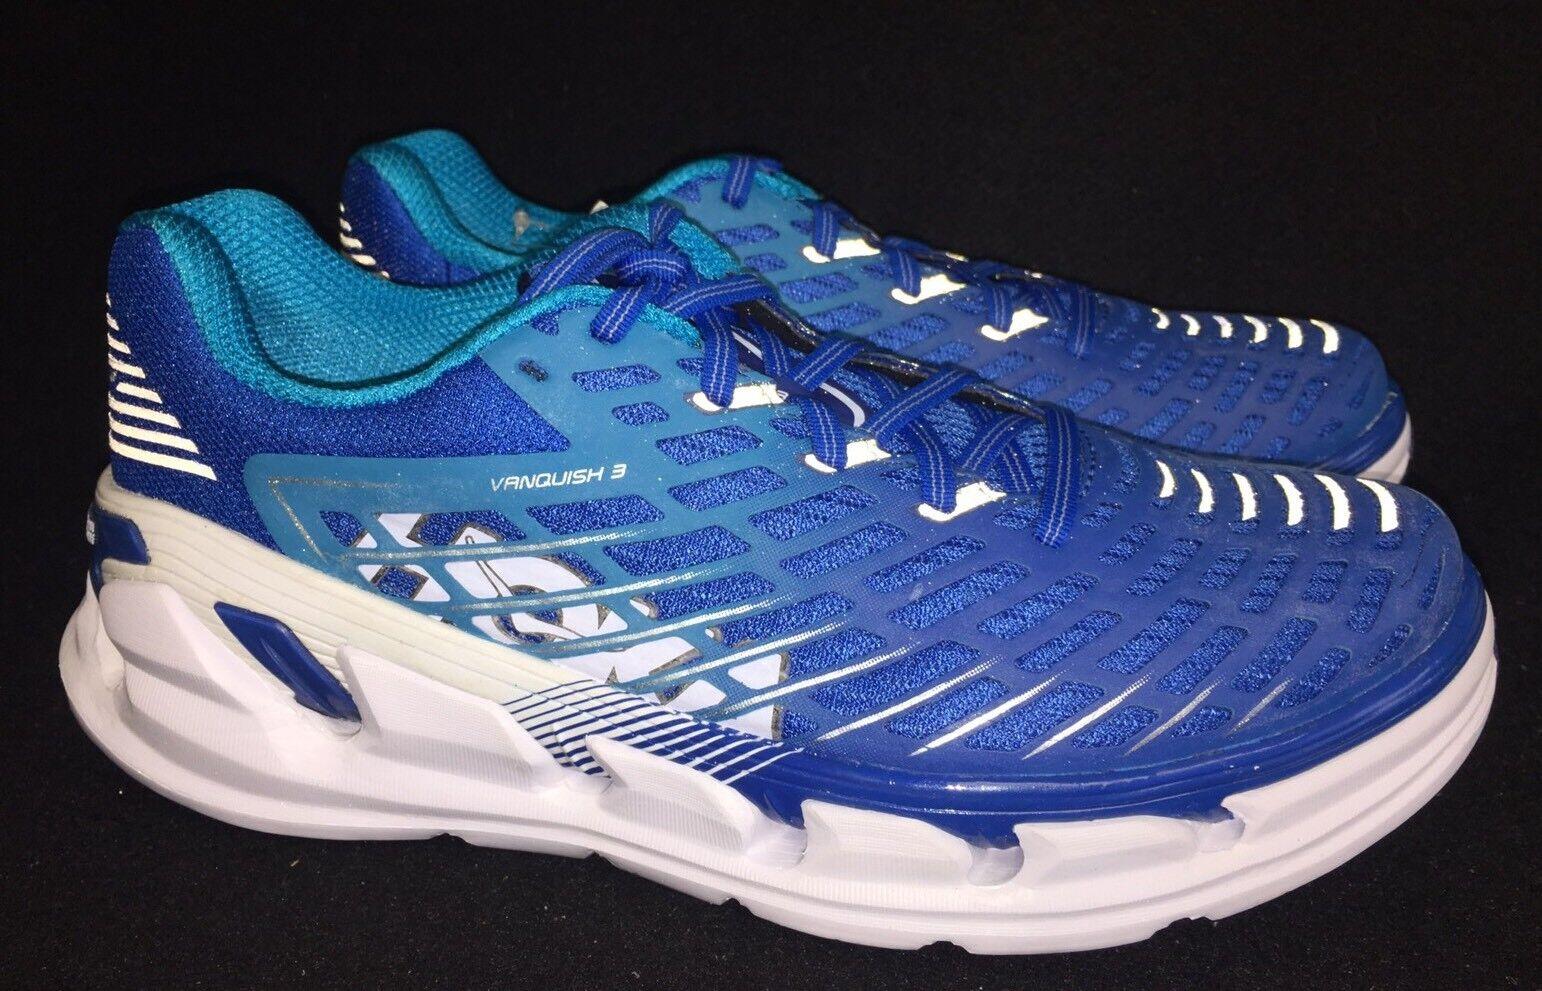 Hoka One One One One Vanquish 3 Running Tennis scarpe Medieval blu   blu Uomo Dimensiones 26513b